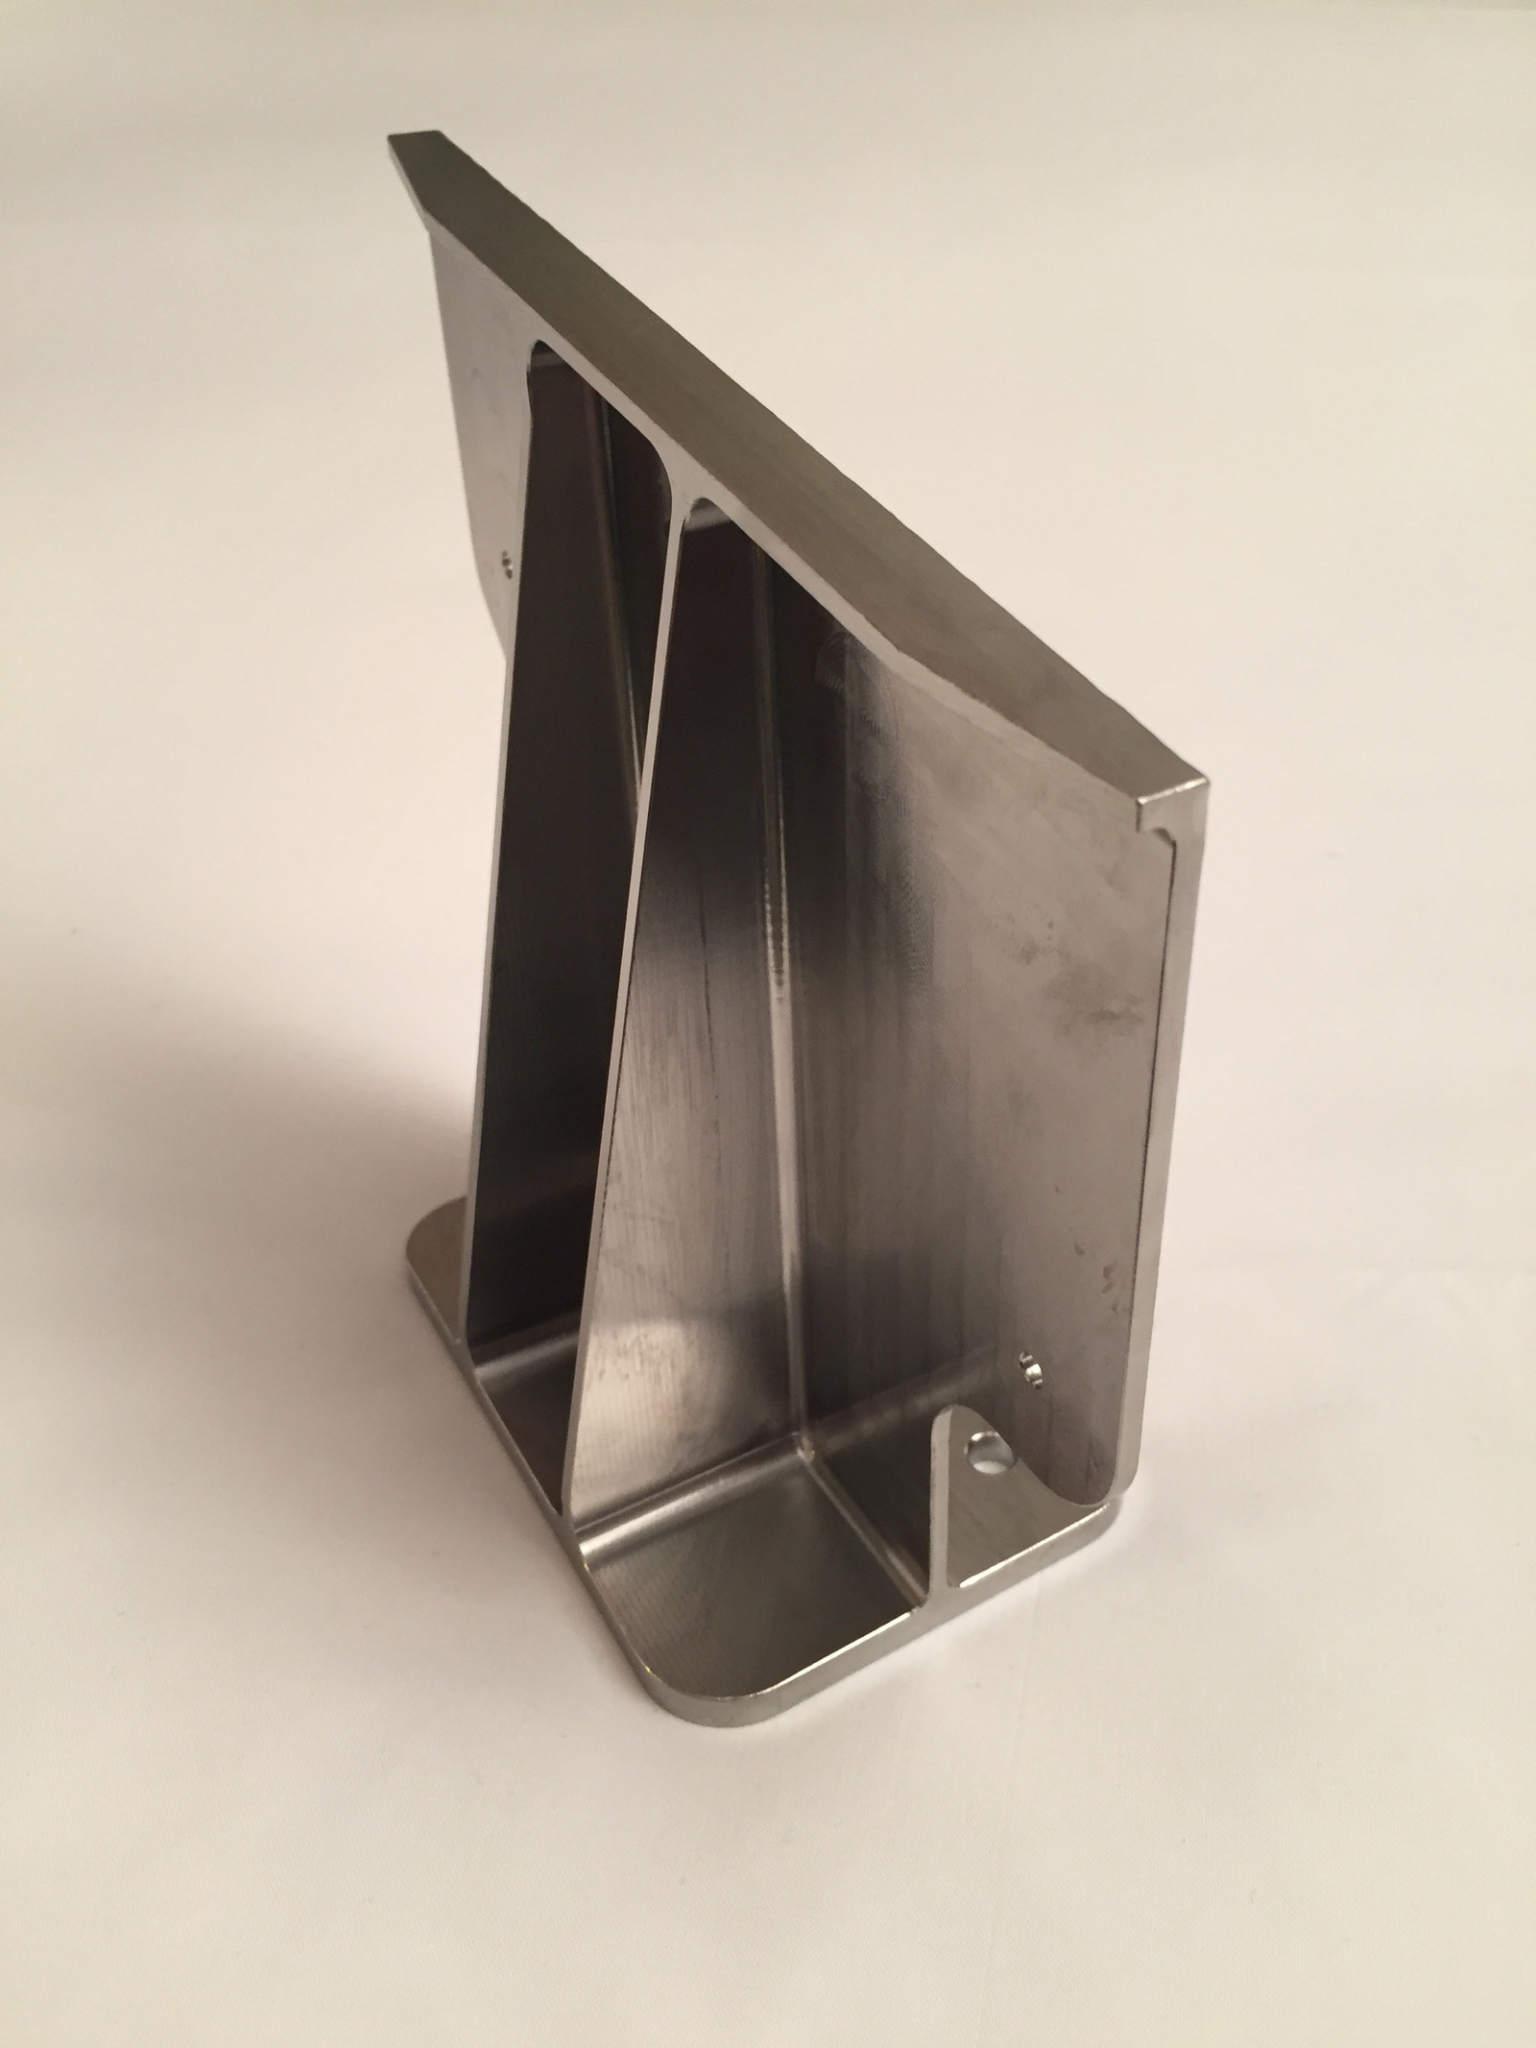 One of Norsk Titanium's 3D printed parts. Image via PRNewsfoto/Spirit AeroSystems Inc.